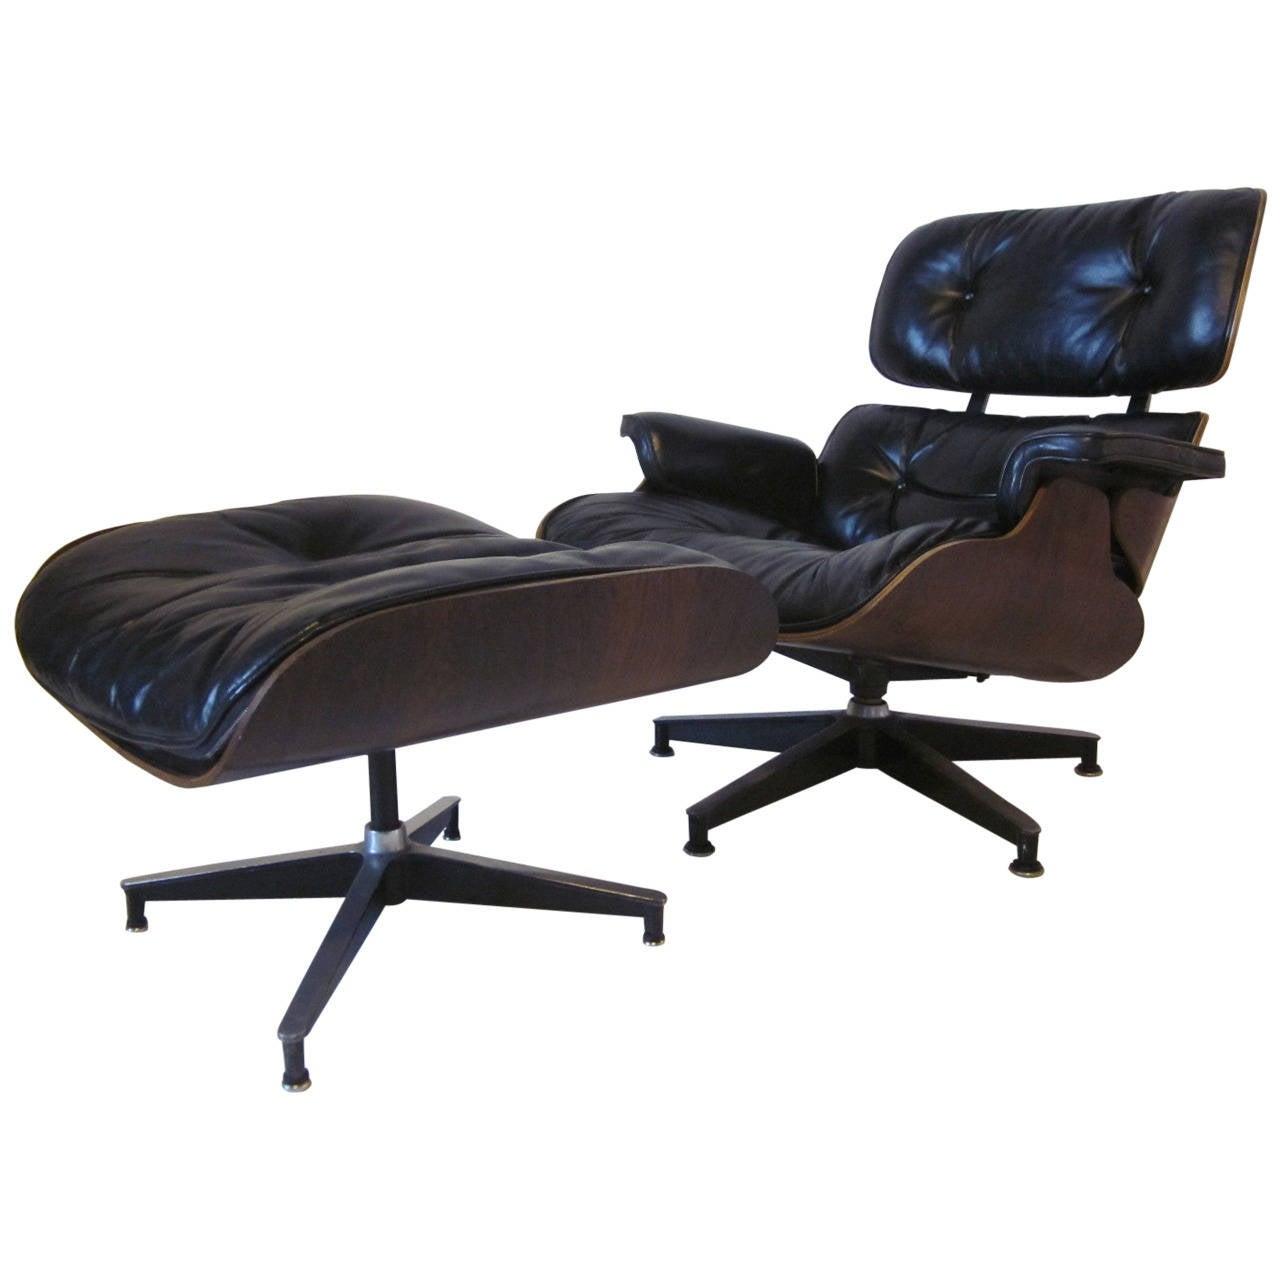 Eames Herman Miller 670 Lounge Chair at 1stdibs